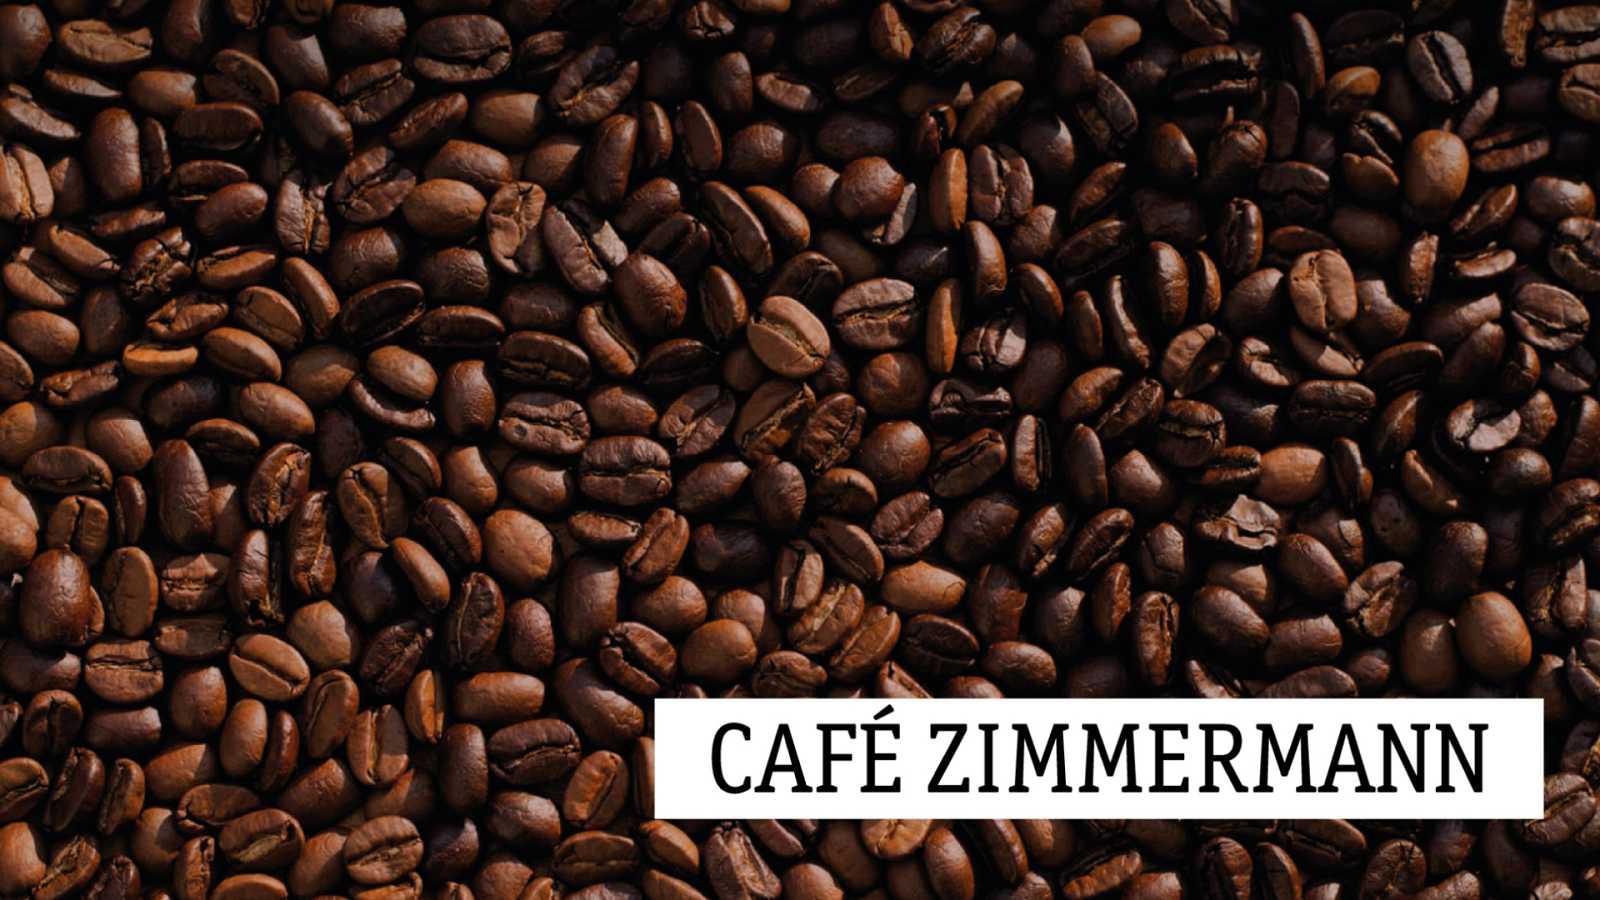 Café Zimmermann - Advertencias - 19/06/20 - escuchar ahora